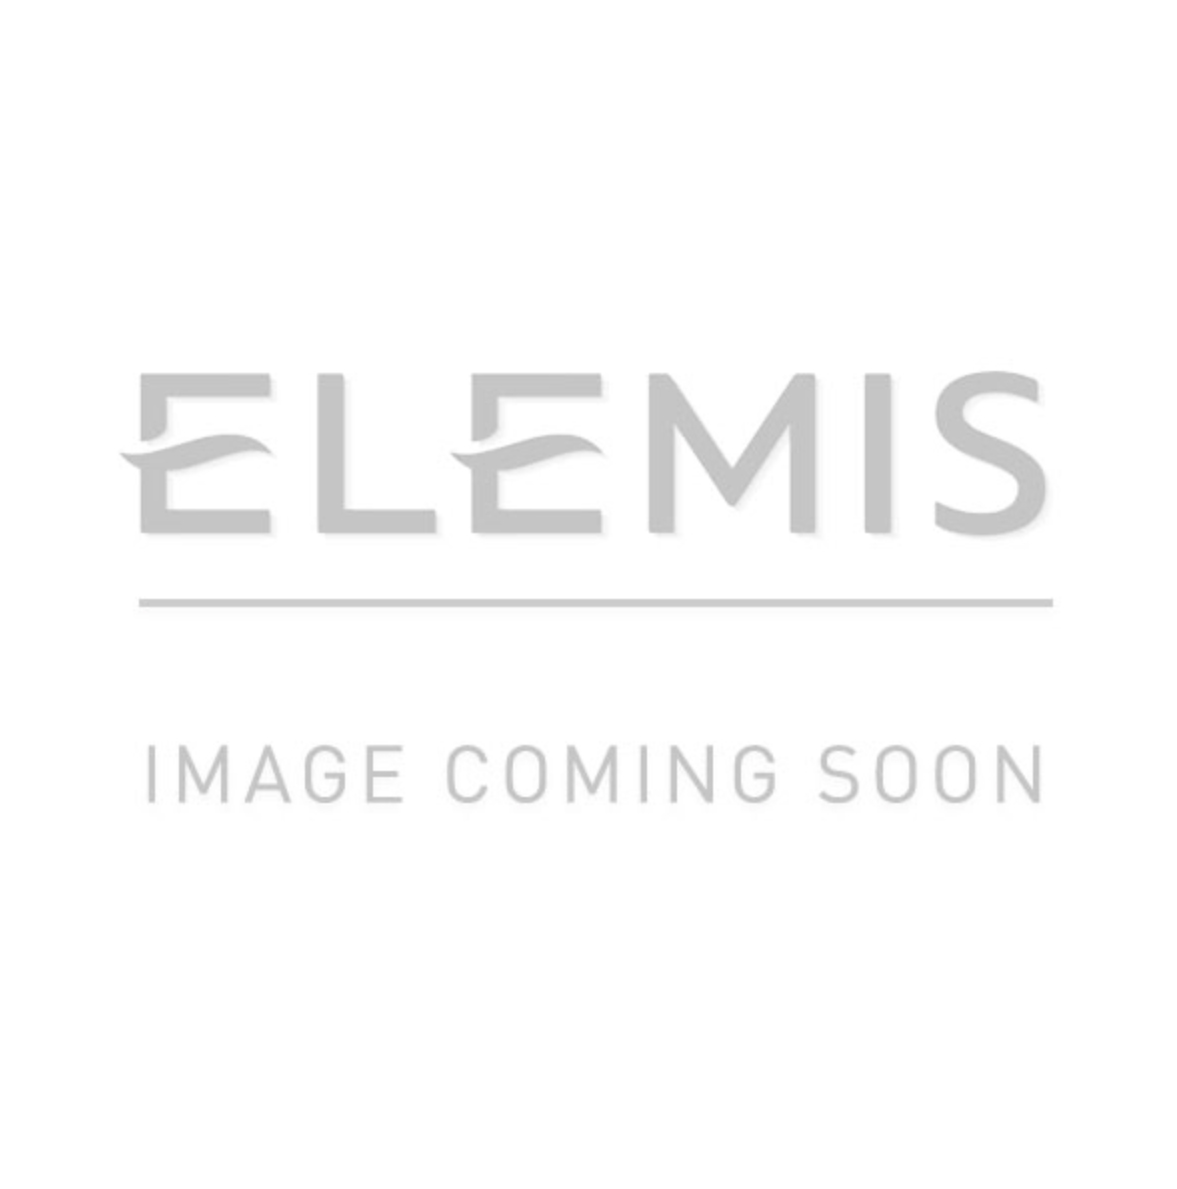 elemis pro collagen eye renewal cream review